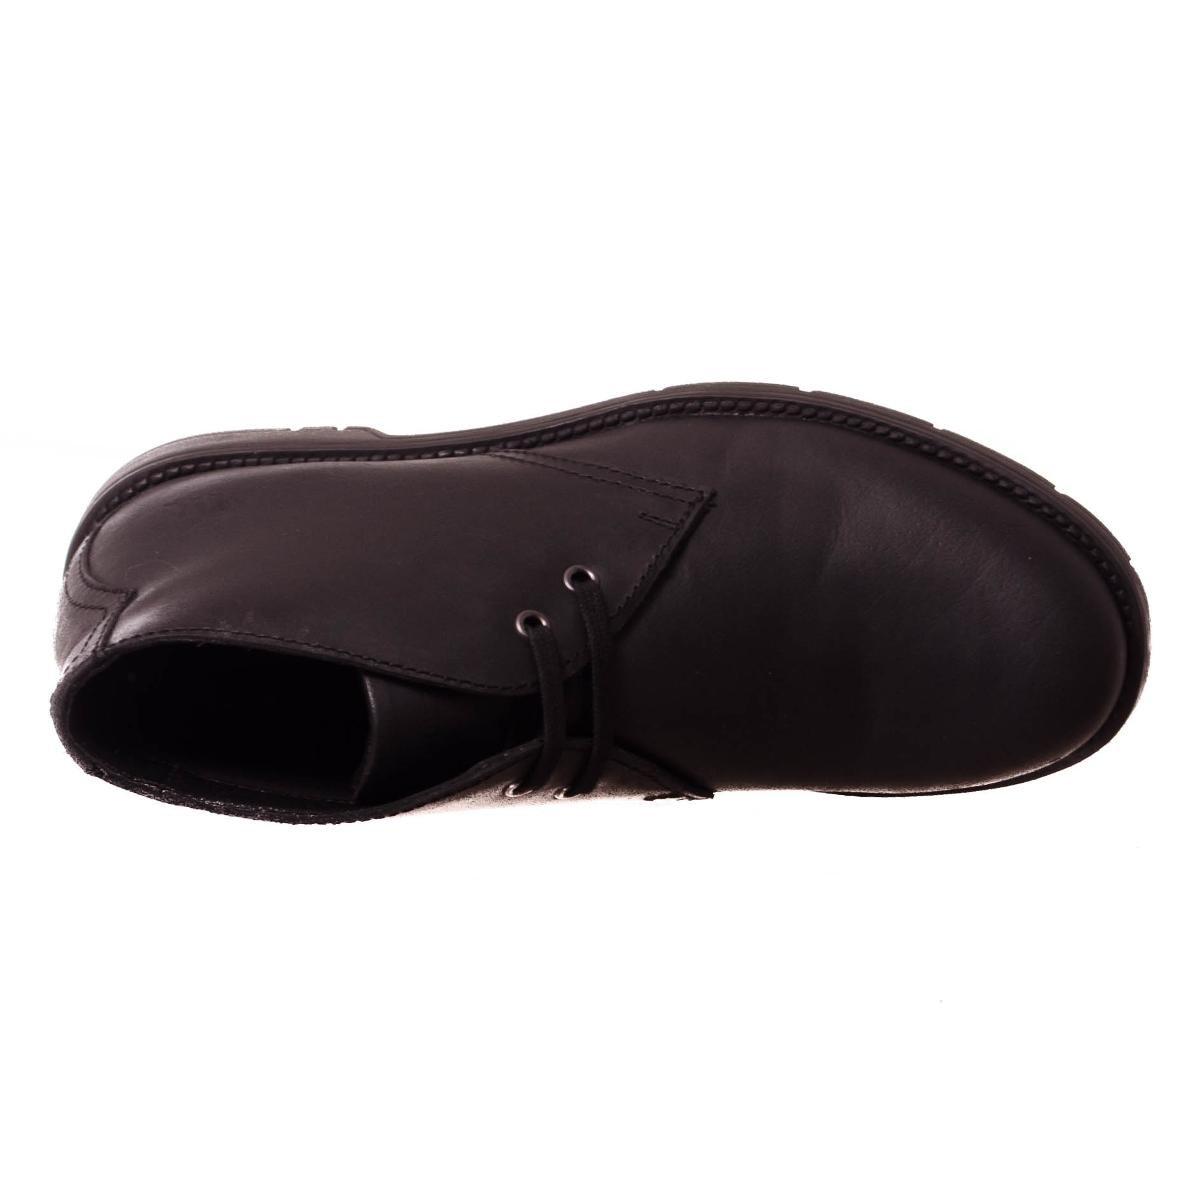 LUMBERJACK Schuhe Mann geschnürt CARSON SM00503-003 H01 CB001 CB001 CB001 4a8361